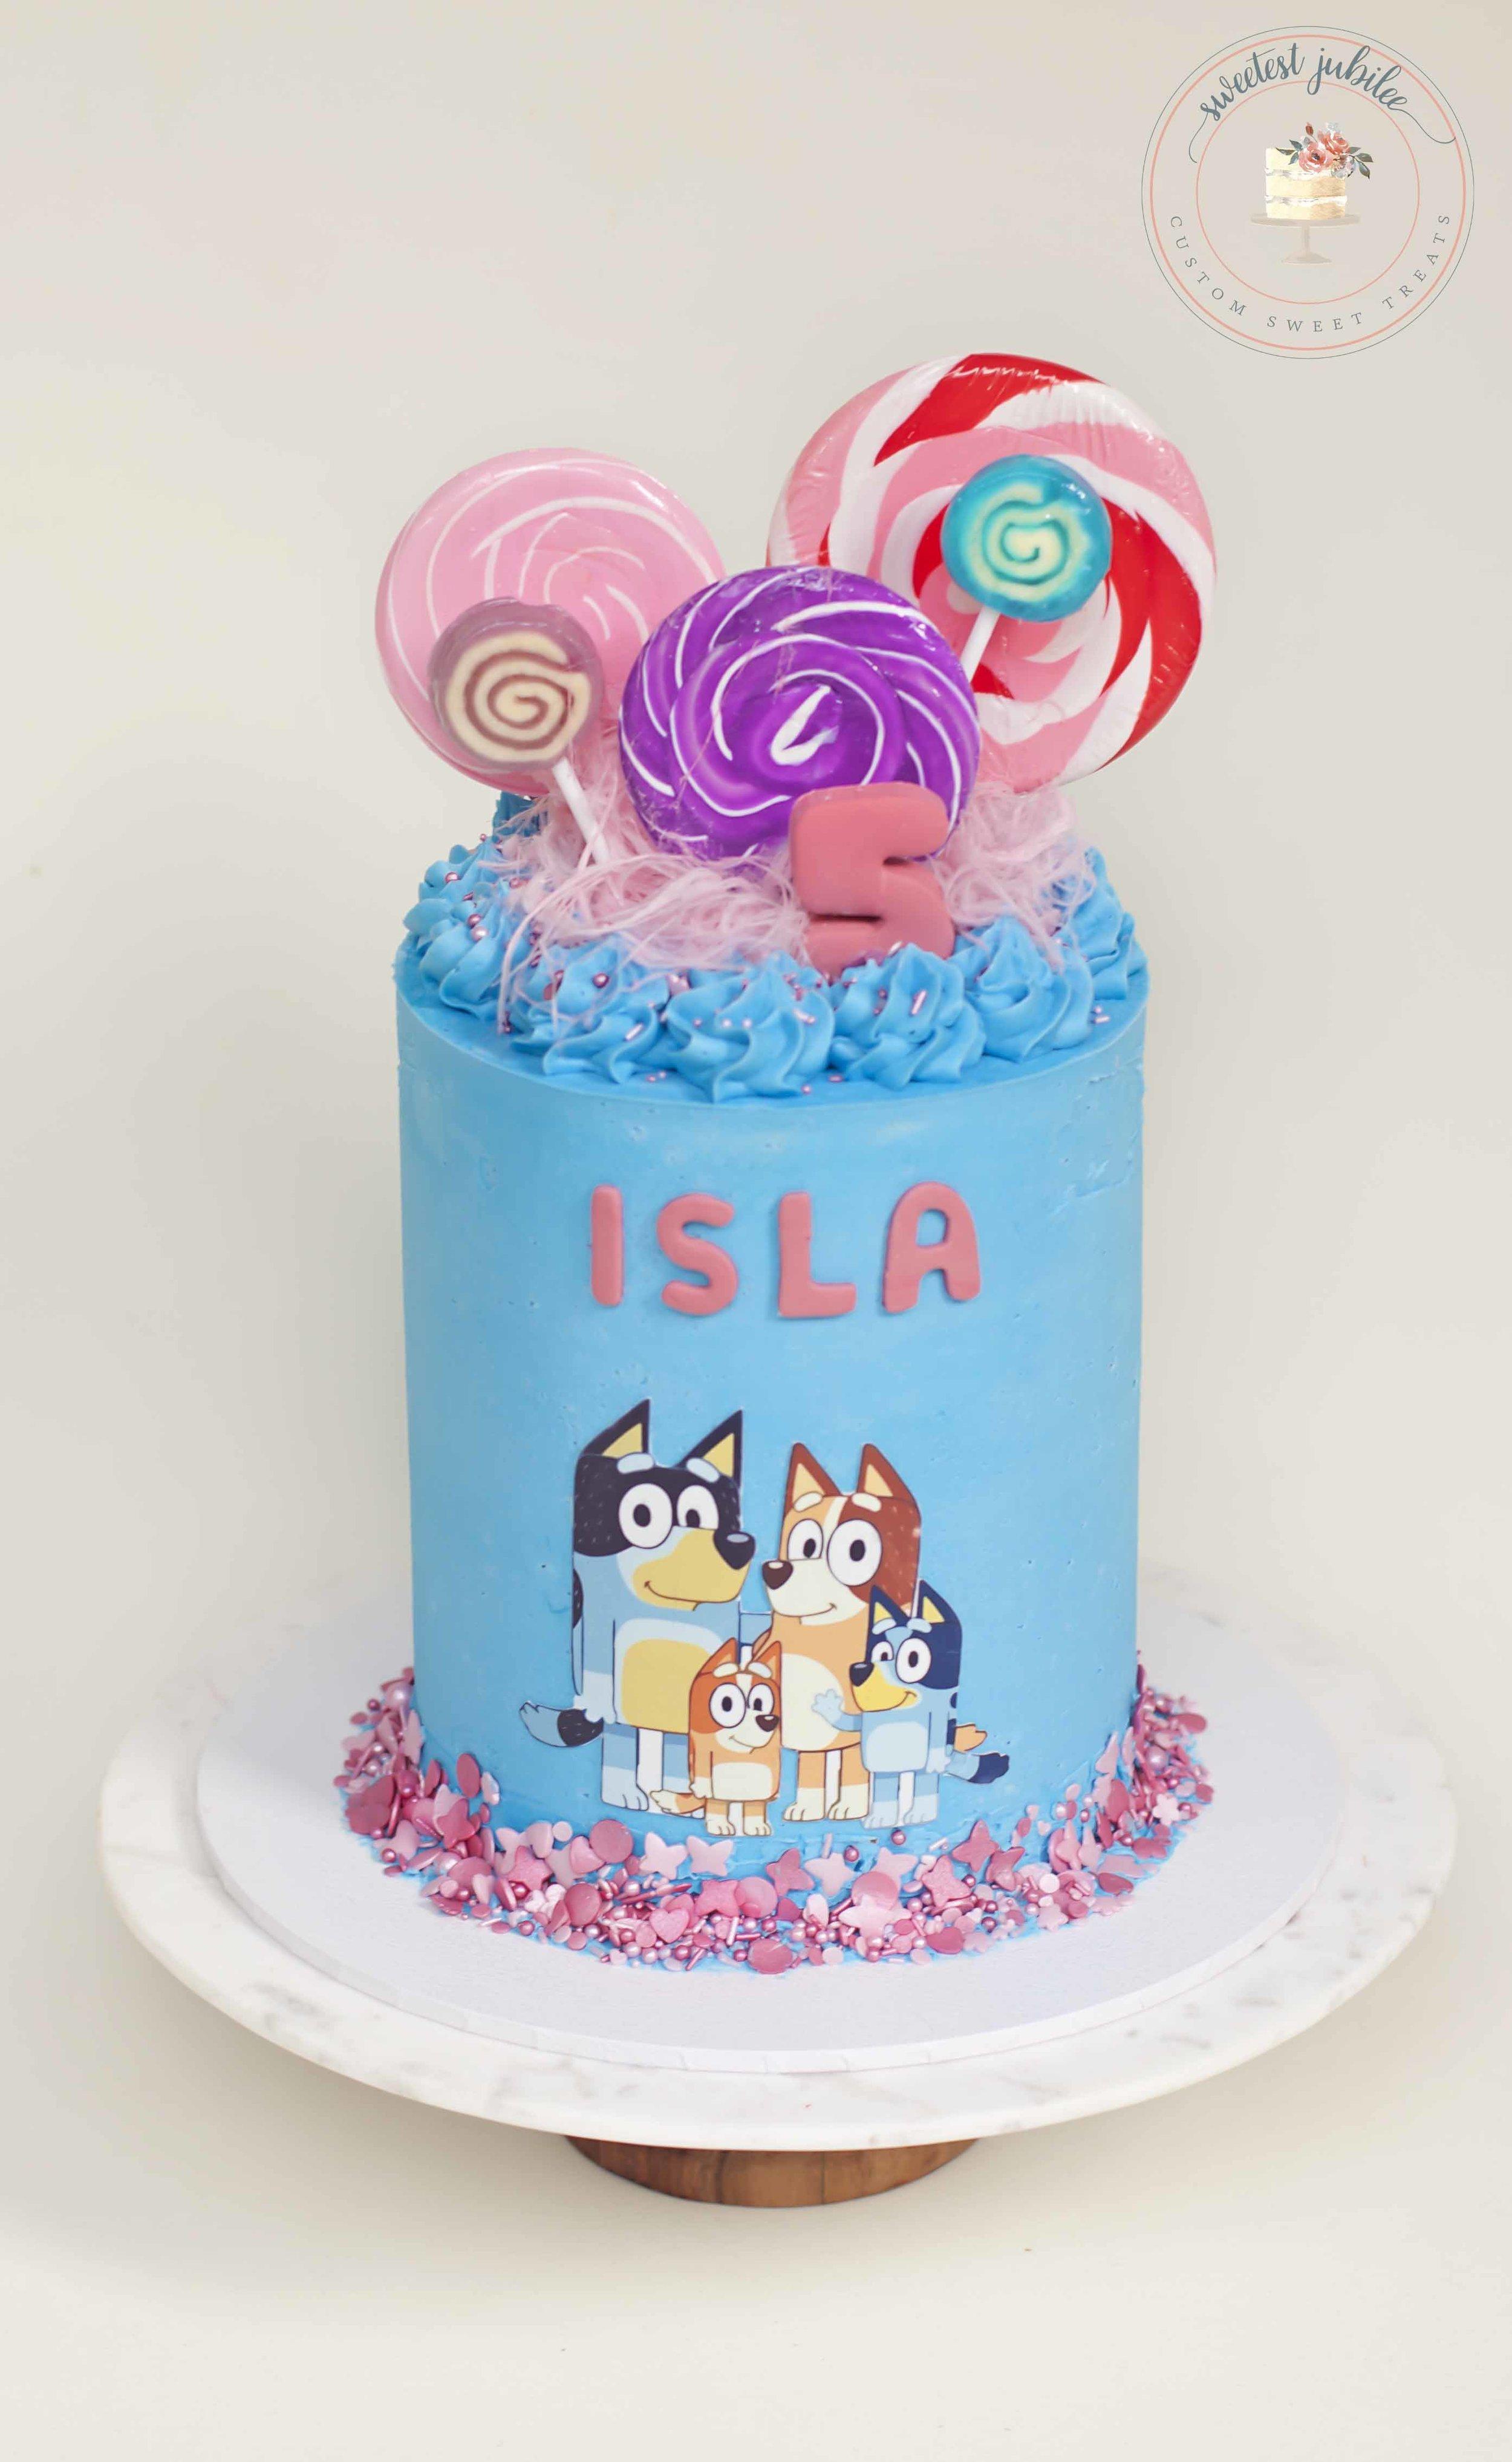 Isla - Bluey cake.jpg